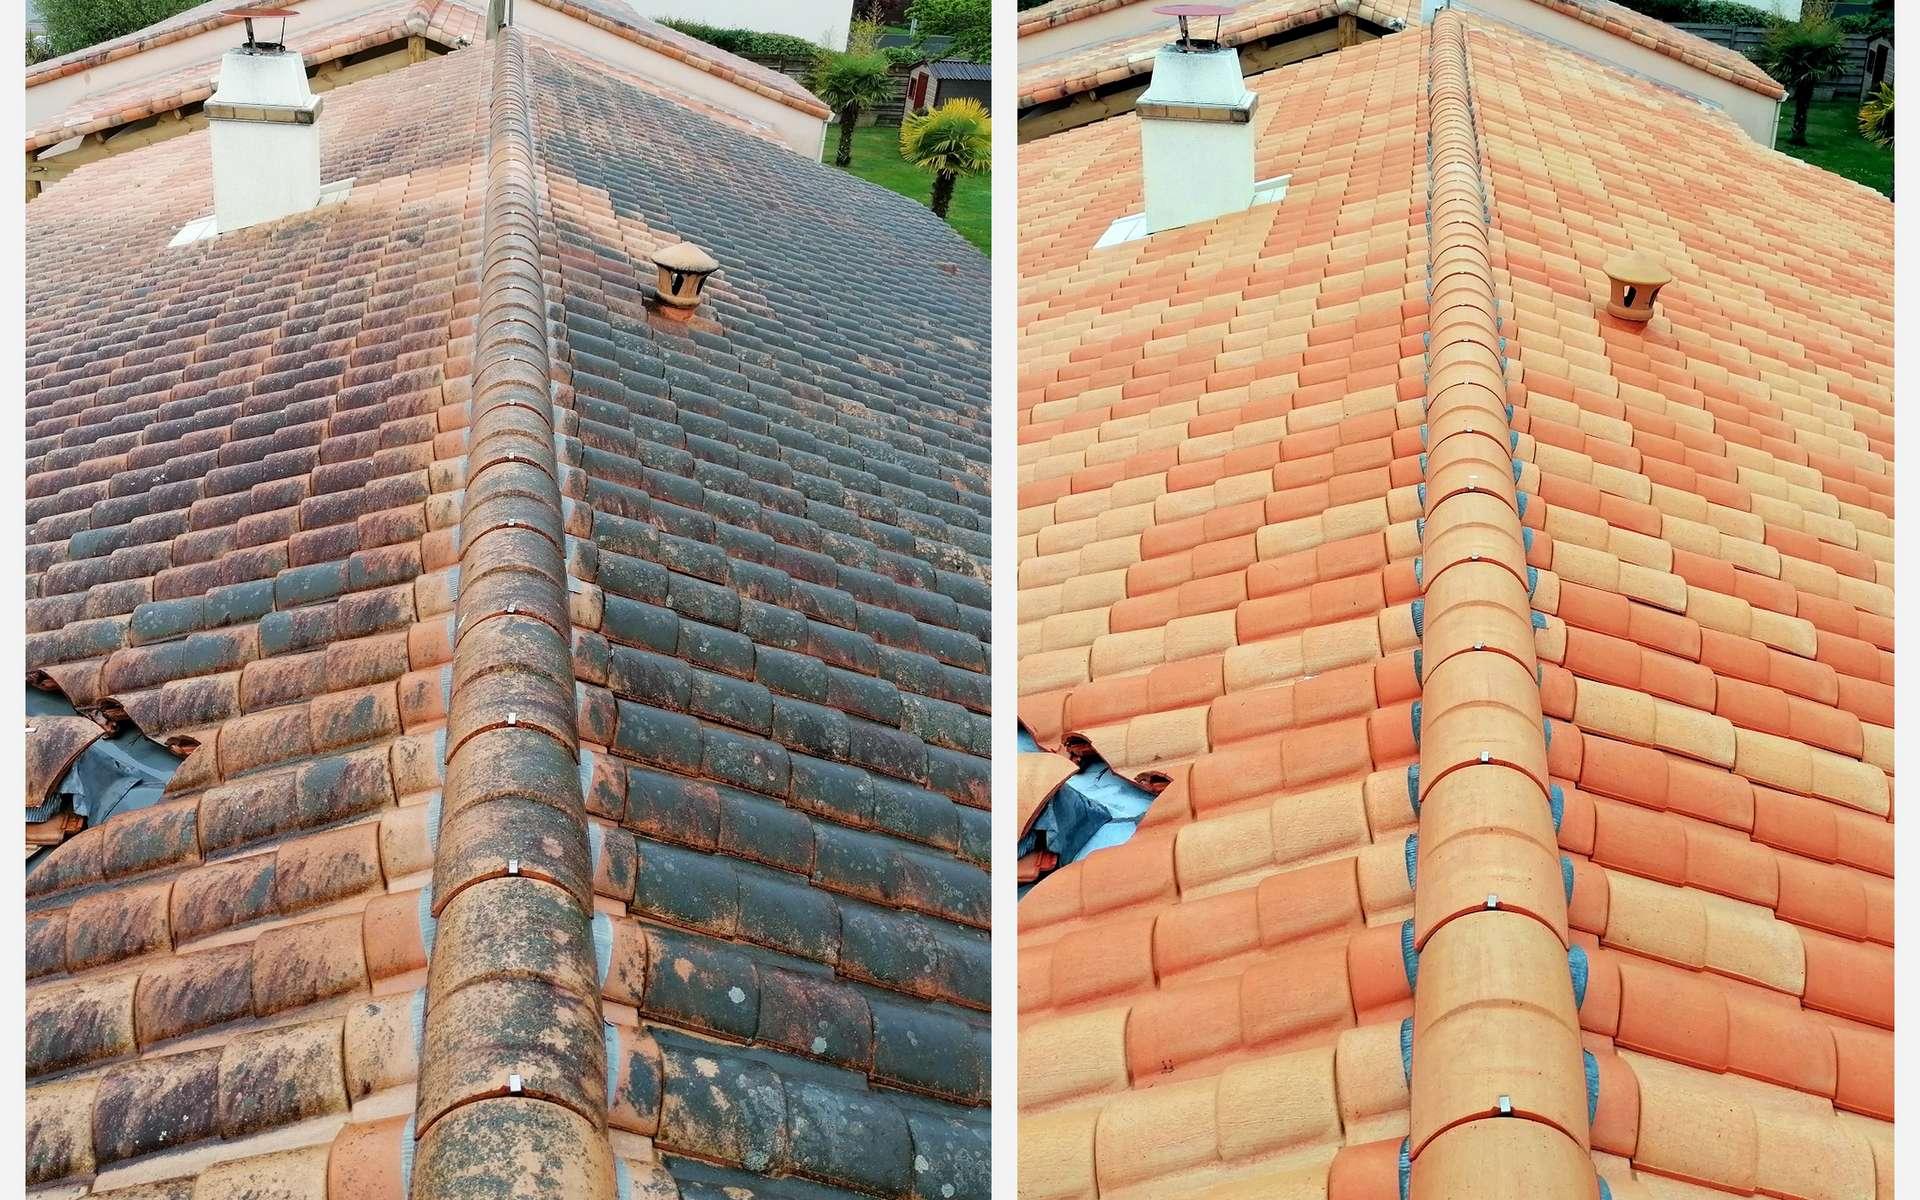 Nettoyage de toiture © Patryssia, AdobeStock